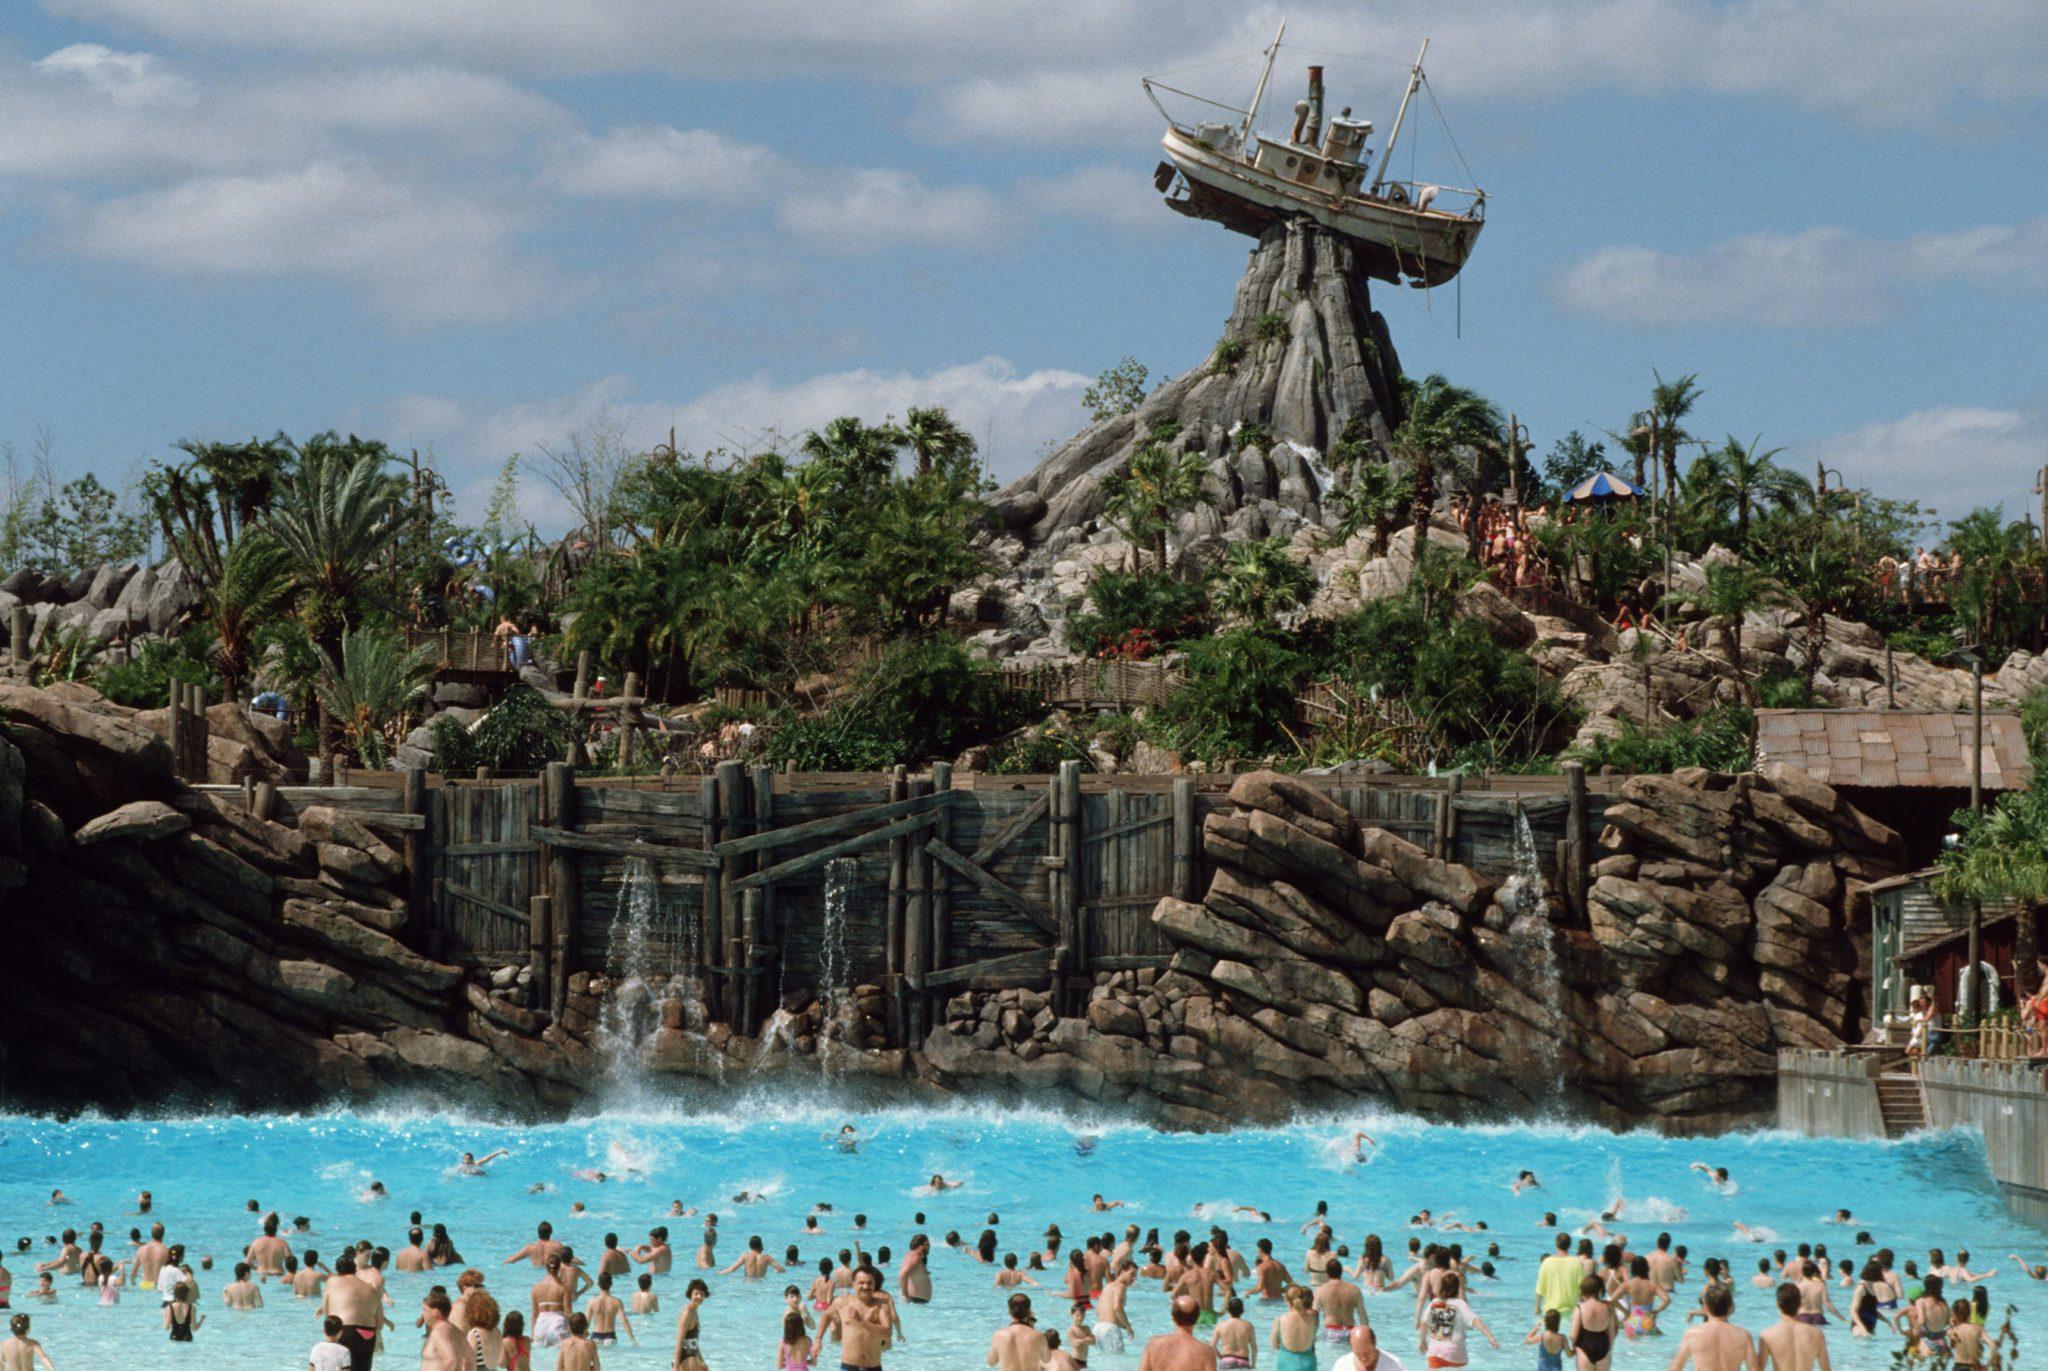 Parques aquáticos em Orlando: Disney's Typhoon Lagoon